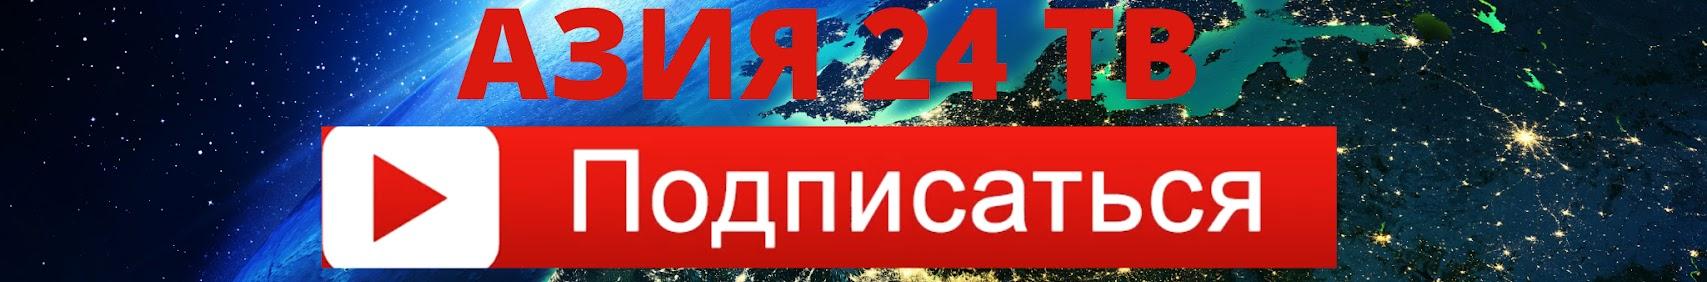 АЗИЯ 24 ТВ